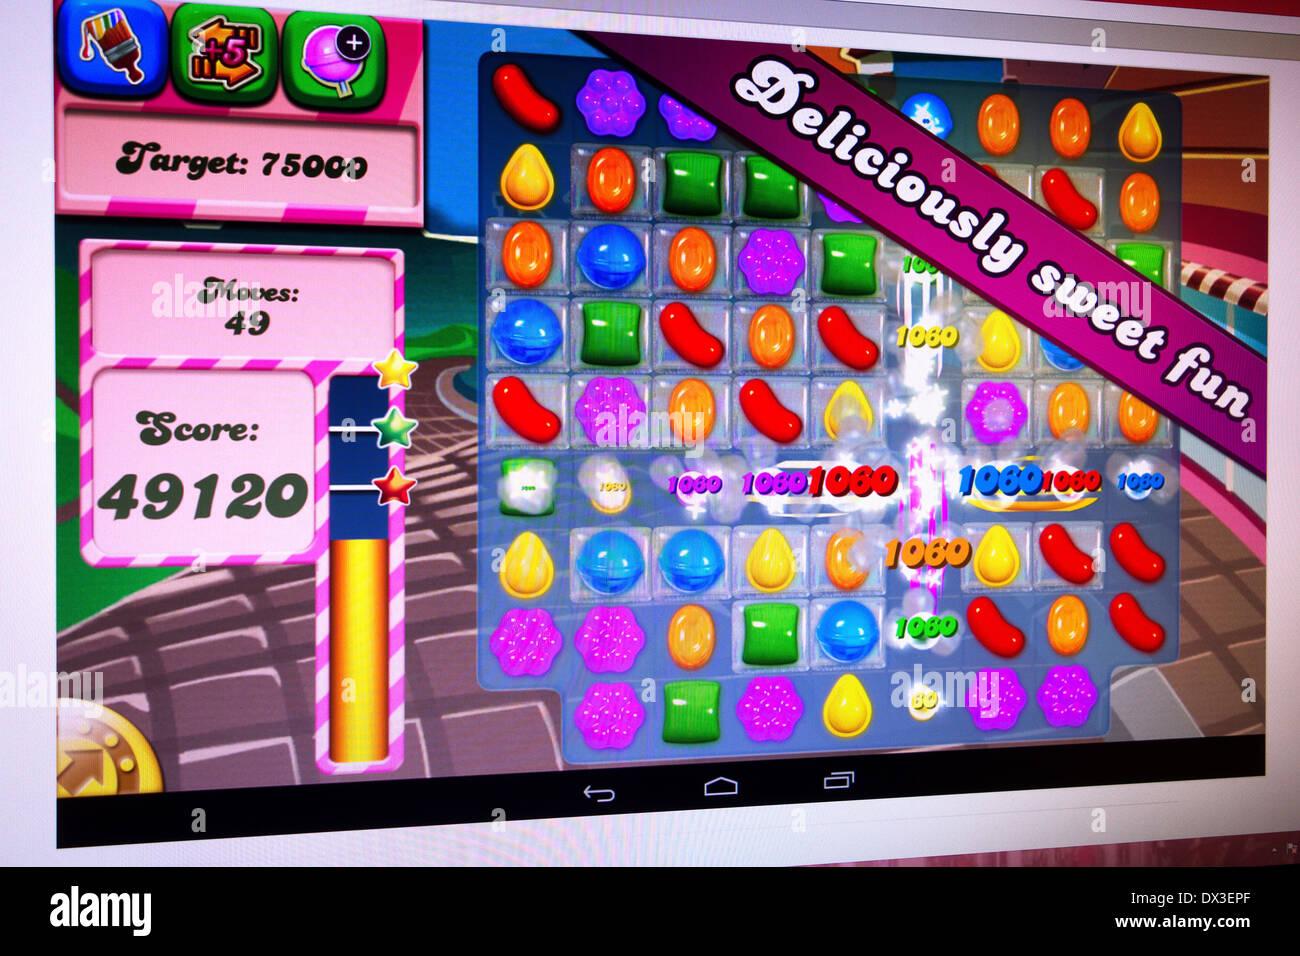 Candy Crush entretenimiento online Imagen De Stock